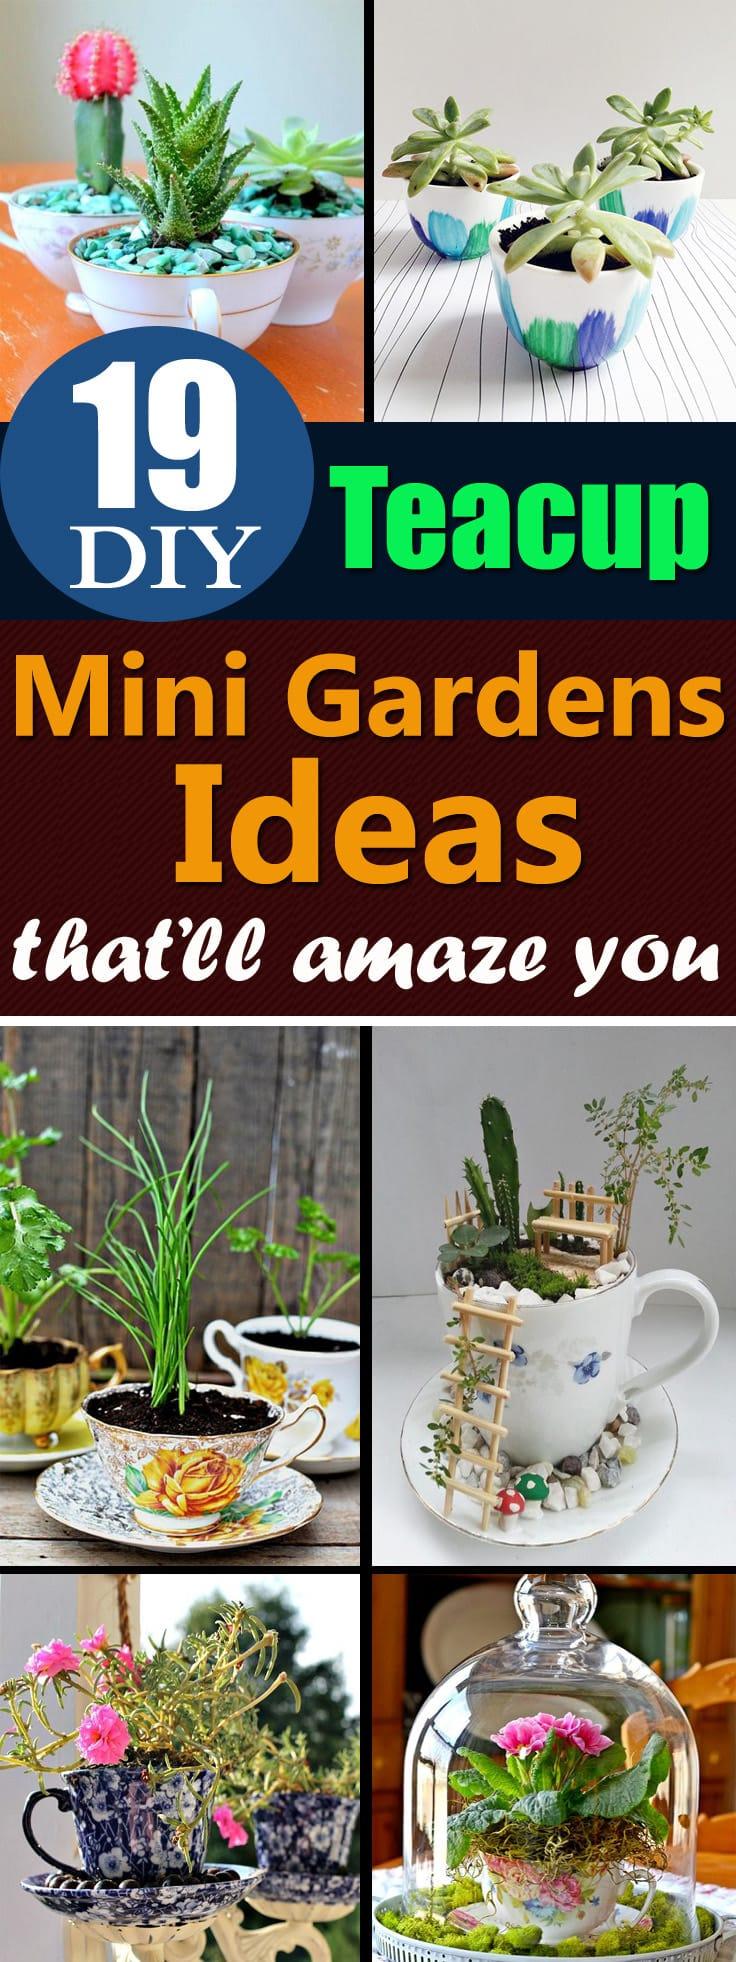 Particular Give A Second Life To Unused Teacups That Se Diy Teacup Diy Teacup Garden Ideas Teacup Planters Balcony Diy Small Garden Ideas Diy Small Space Garden Ideas garden Diy Mini Garden Ideas